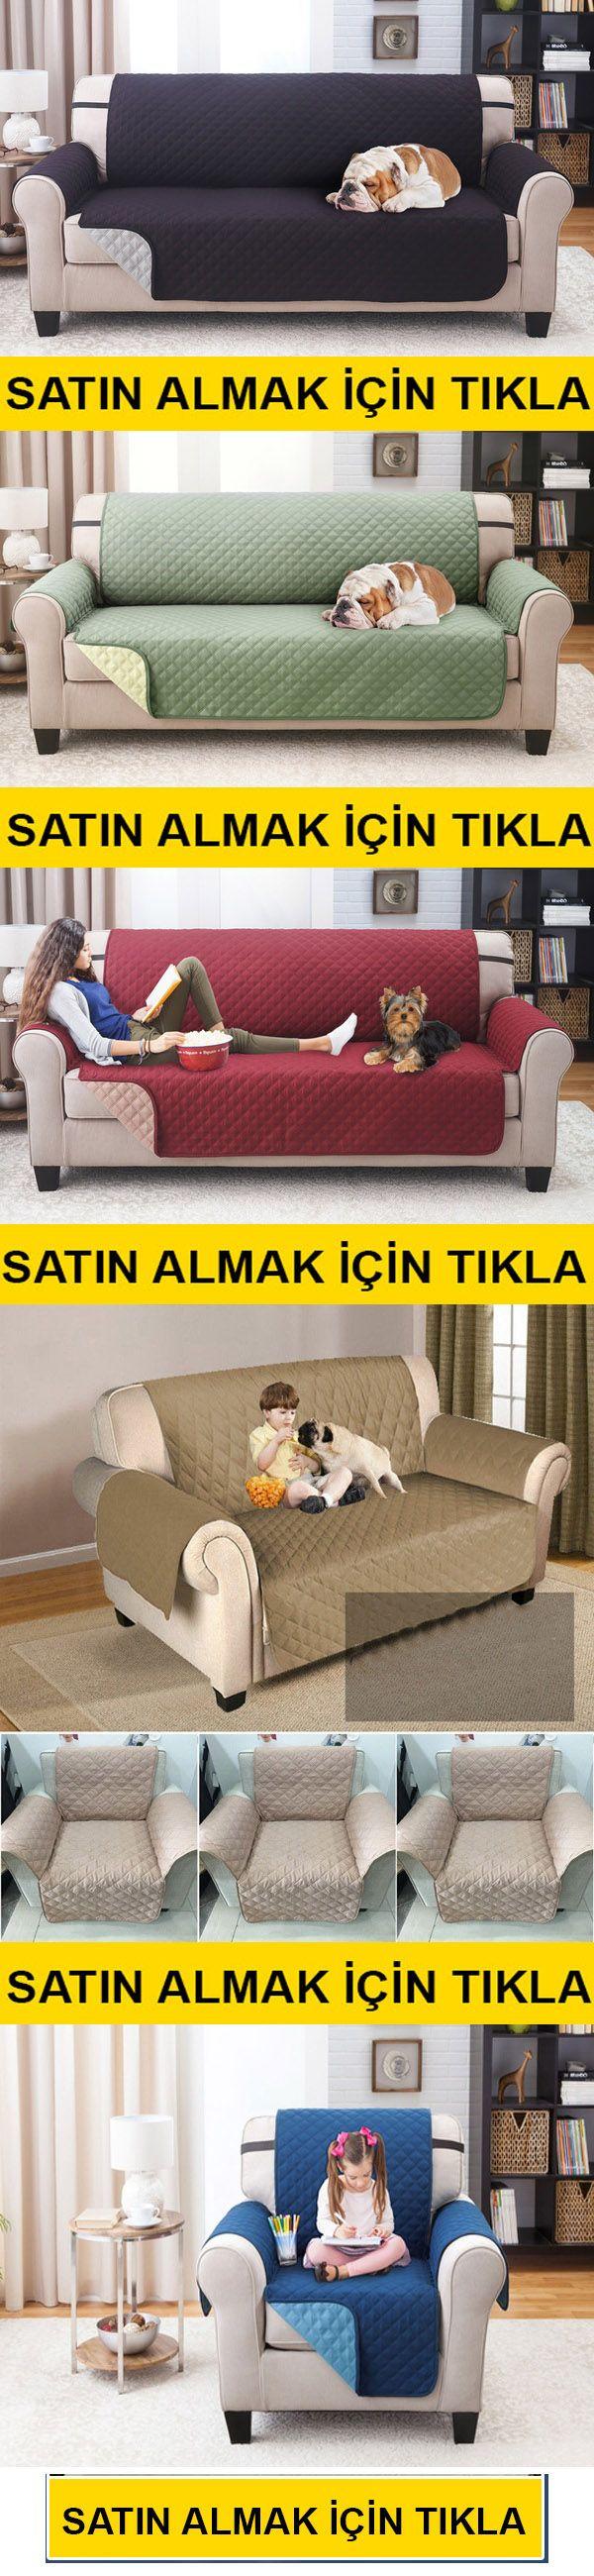 Sofa Saver Koltuk Kilifi Kiliflar Koltuklar Fikirler